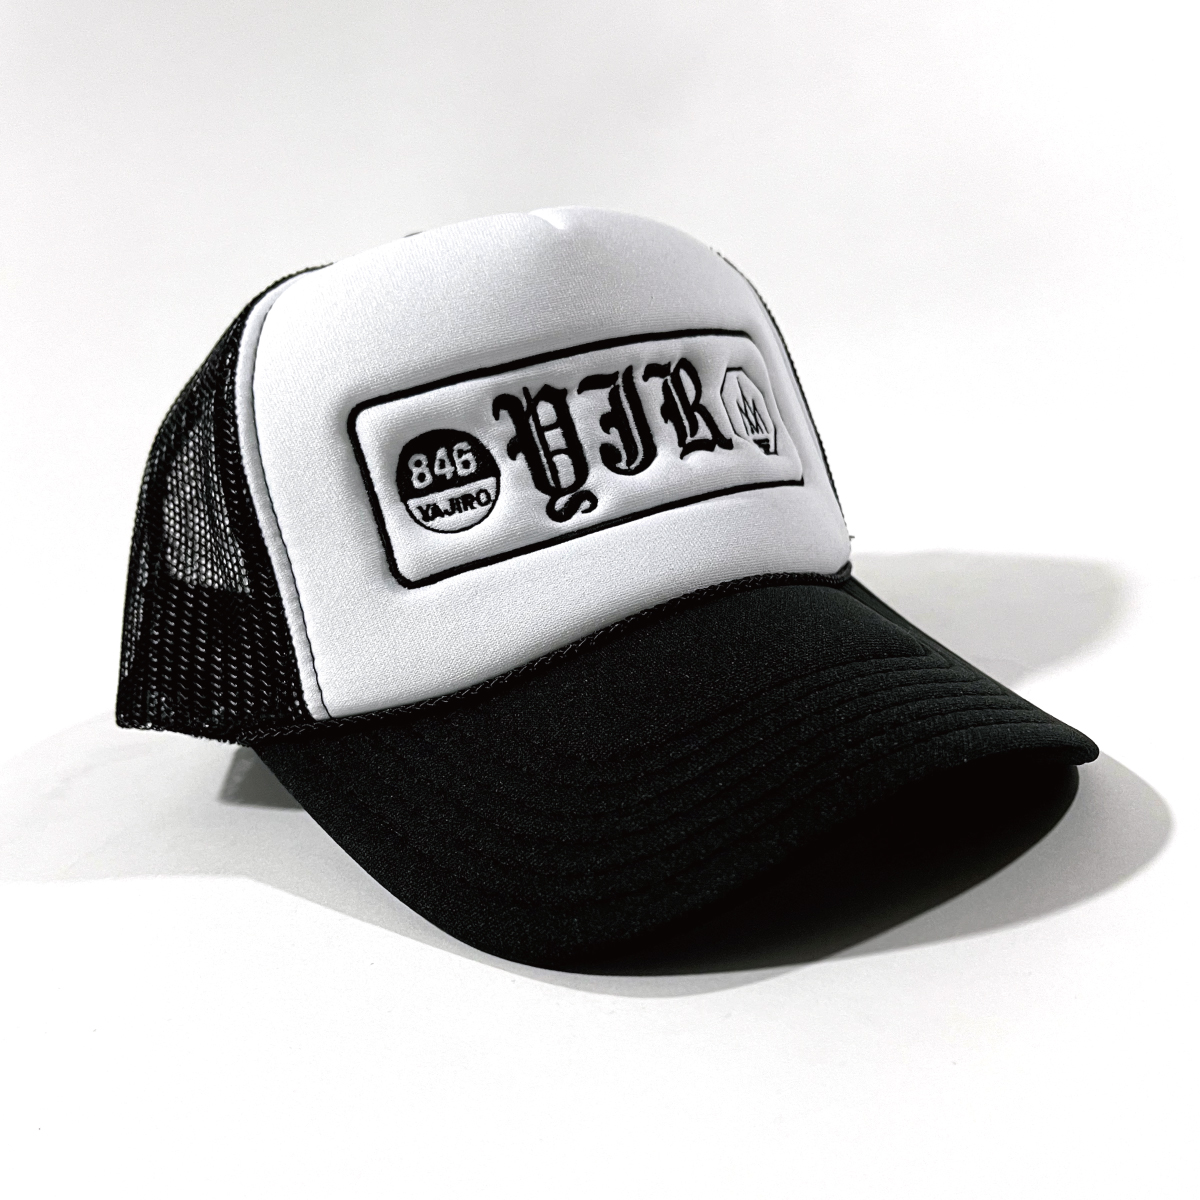 846YAJIRO アパレルキャップ 846キャップ Collection Trucker Cap WHITE ホワイト メンズ デザイン 至高 おしゃれ ナンバーデザイン アパレル 帽子 トラッカーキャップ 付与 レディース